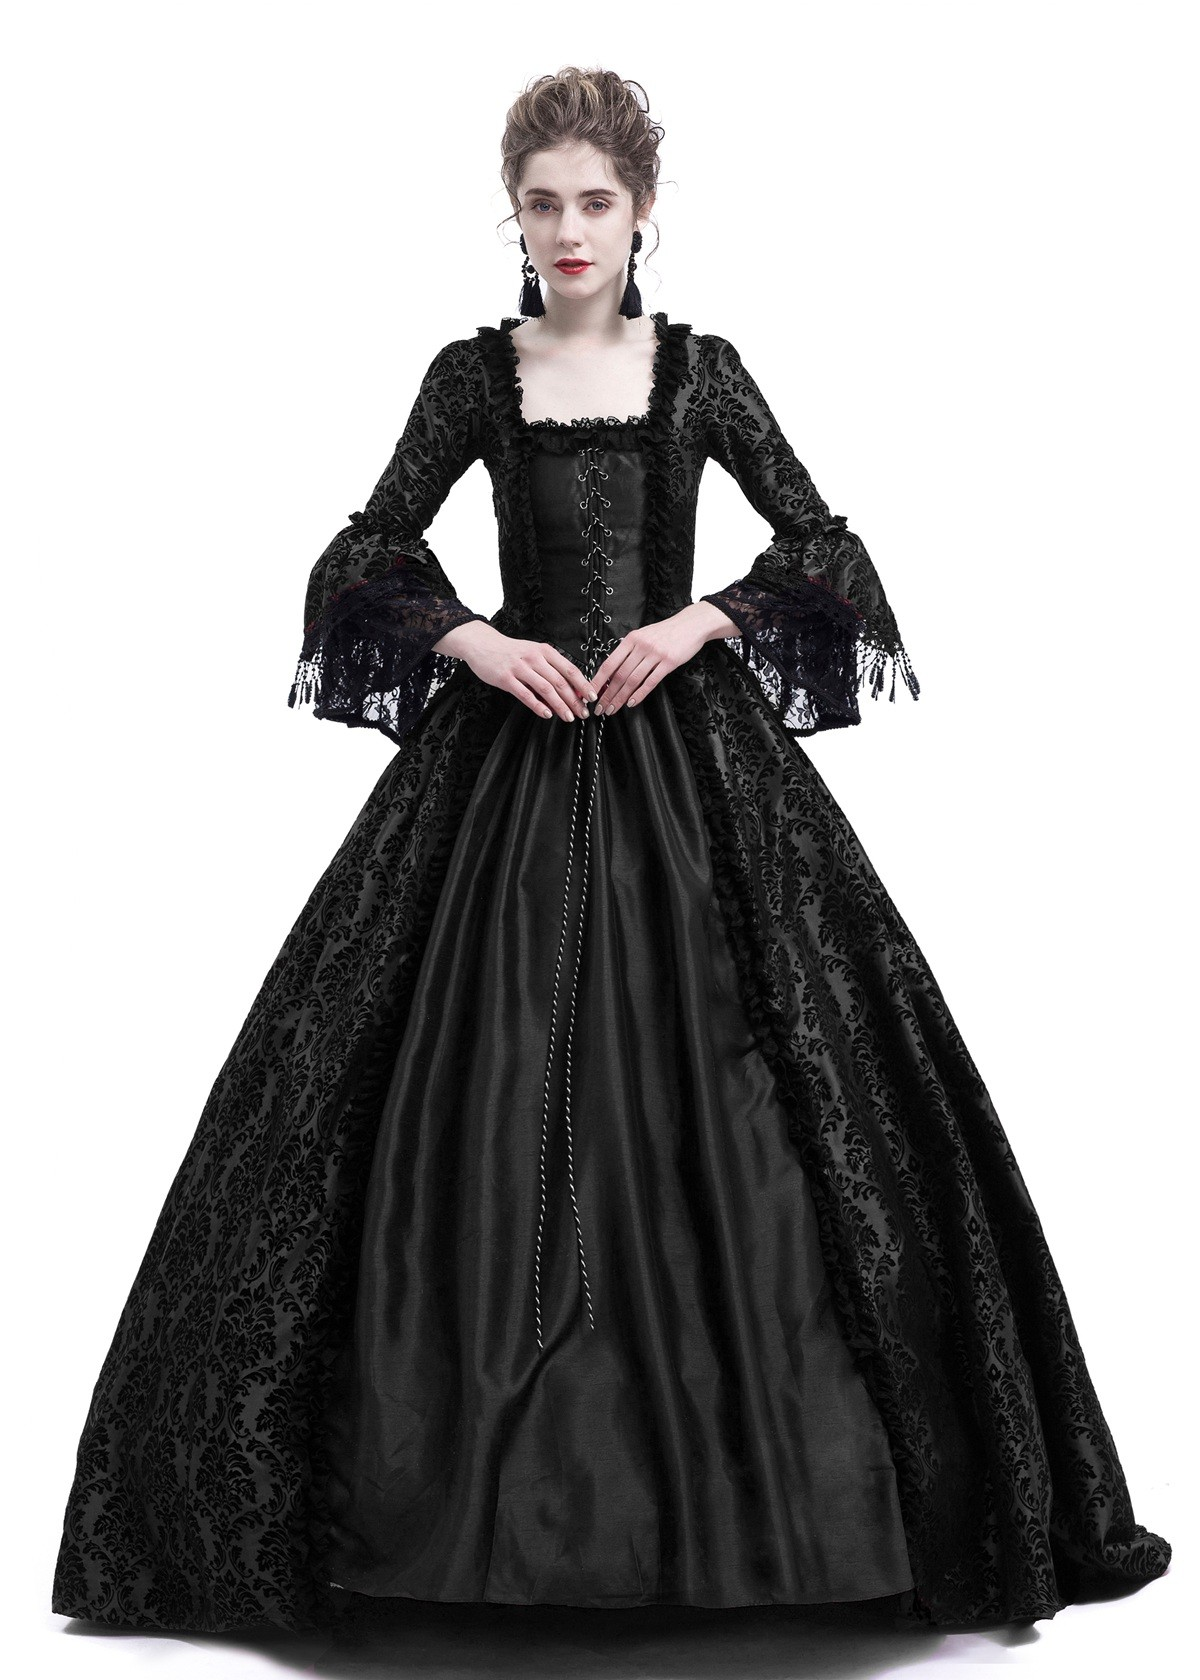 Black Ball Gown Victorian Masquerade Dress D3018 - D-RoseBlooming